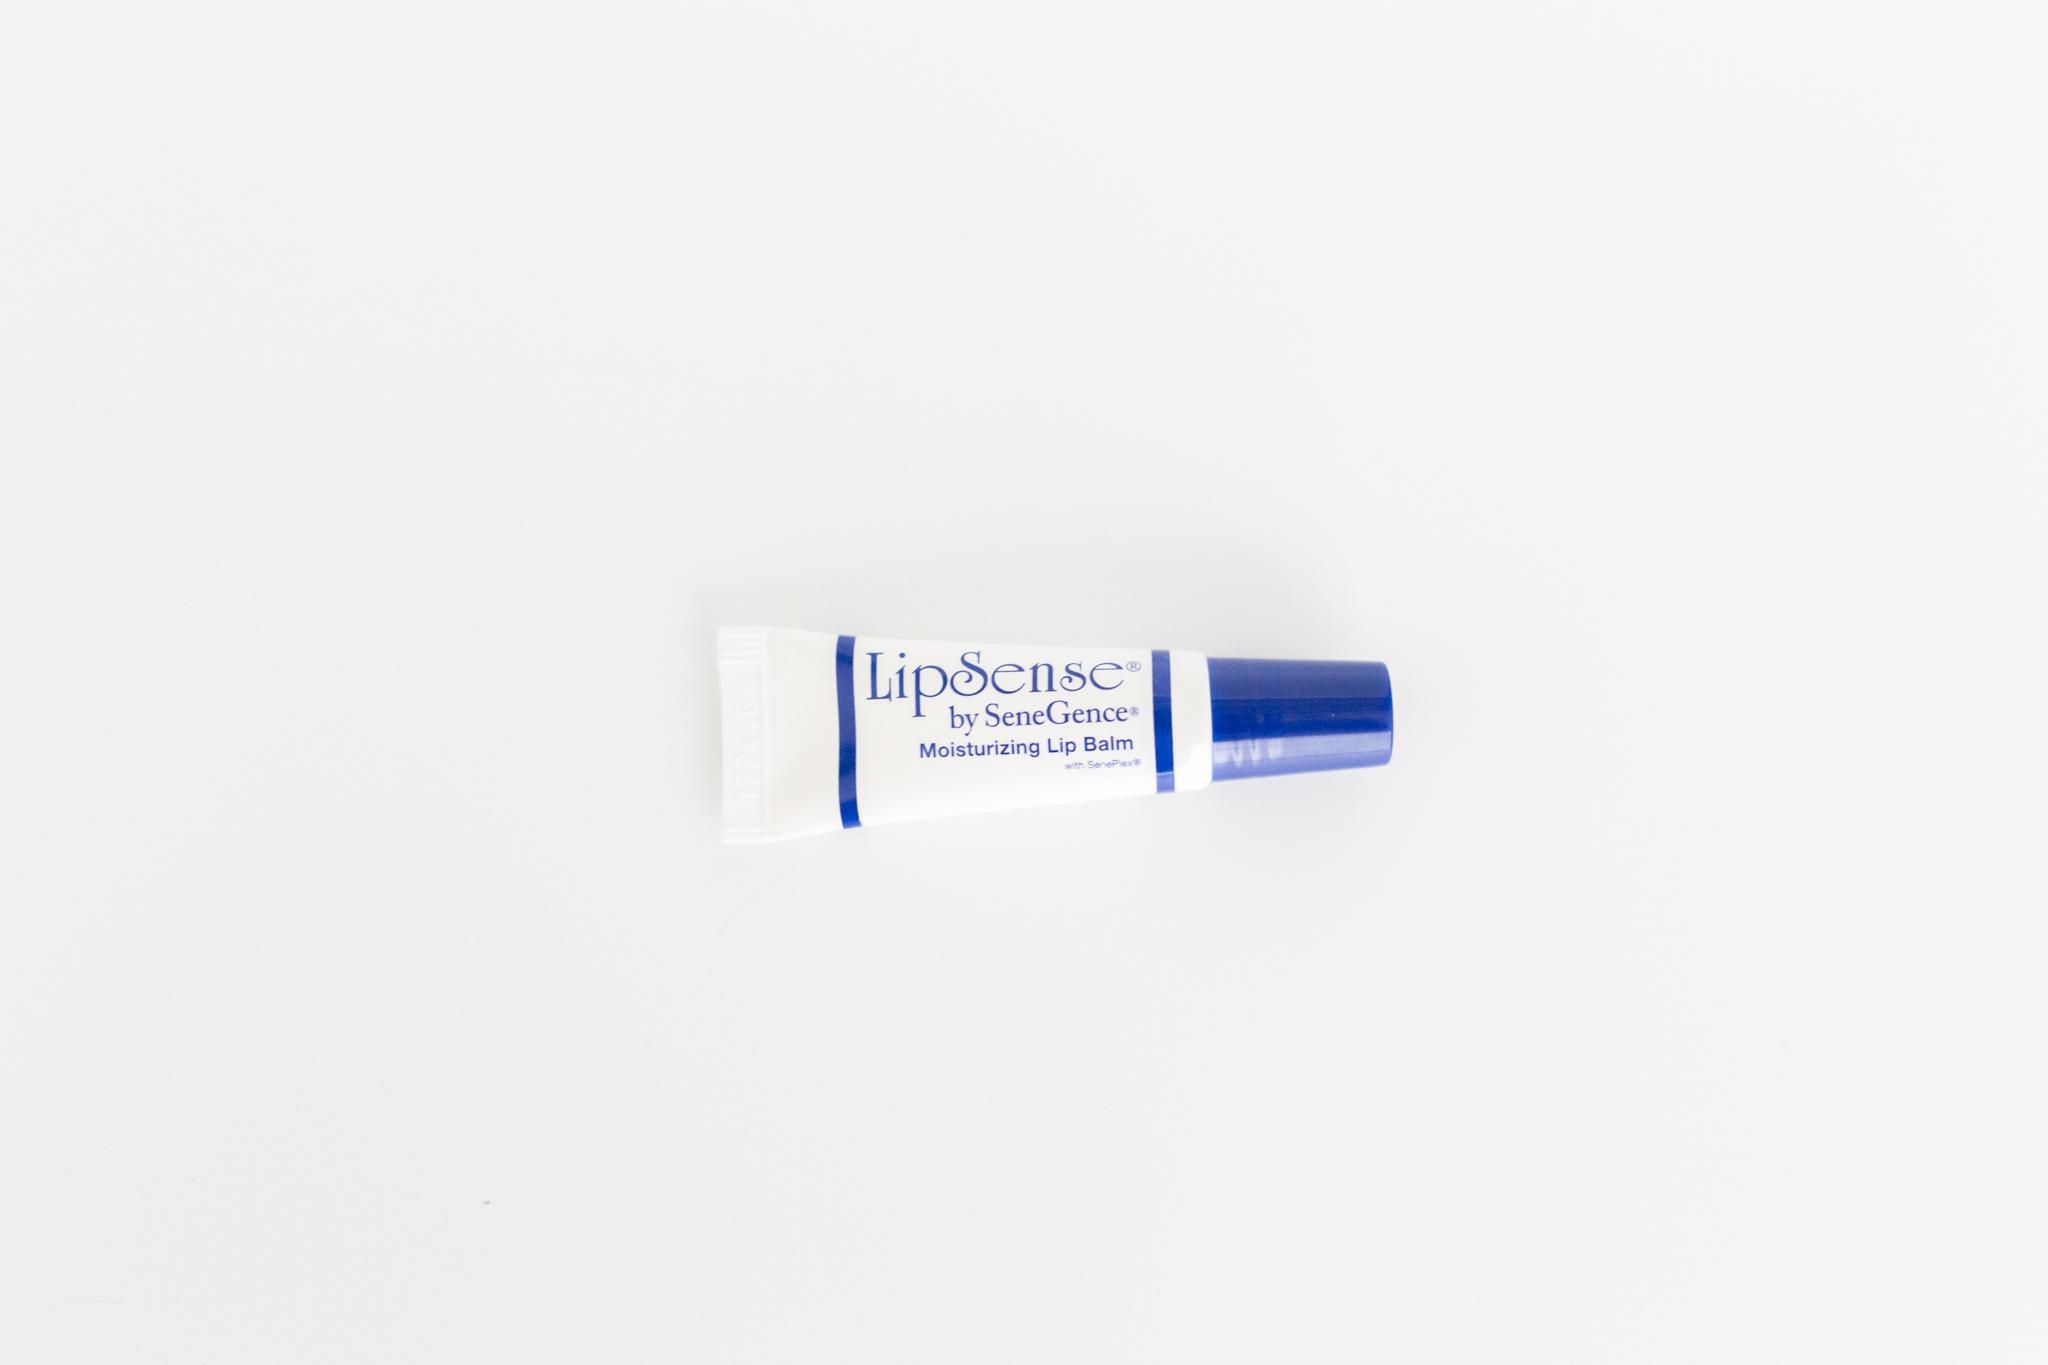 Senegence Moisturizing Lip Balm